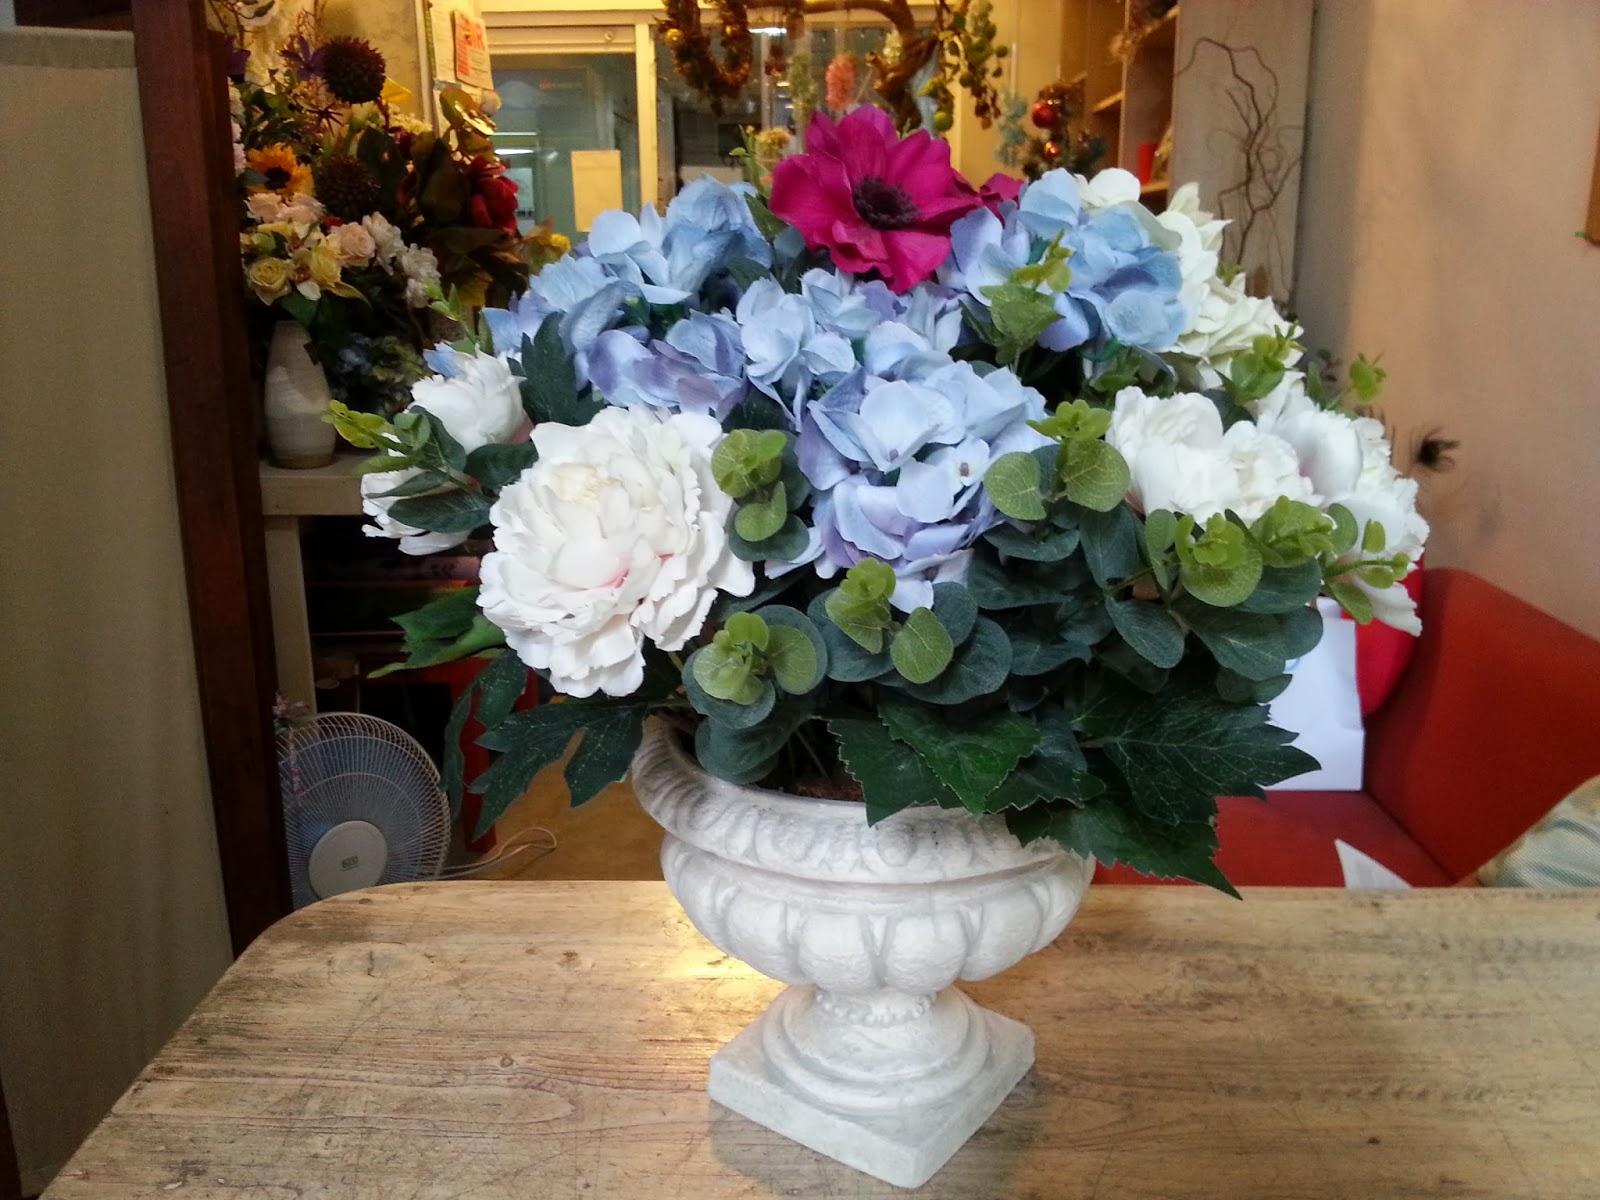 Hydrangea Artificial Flowers With Nice Antique Vase Flower Delivery In Ortigas Makati Bonifacio All Metro Manila